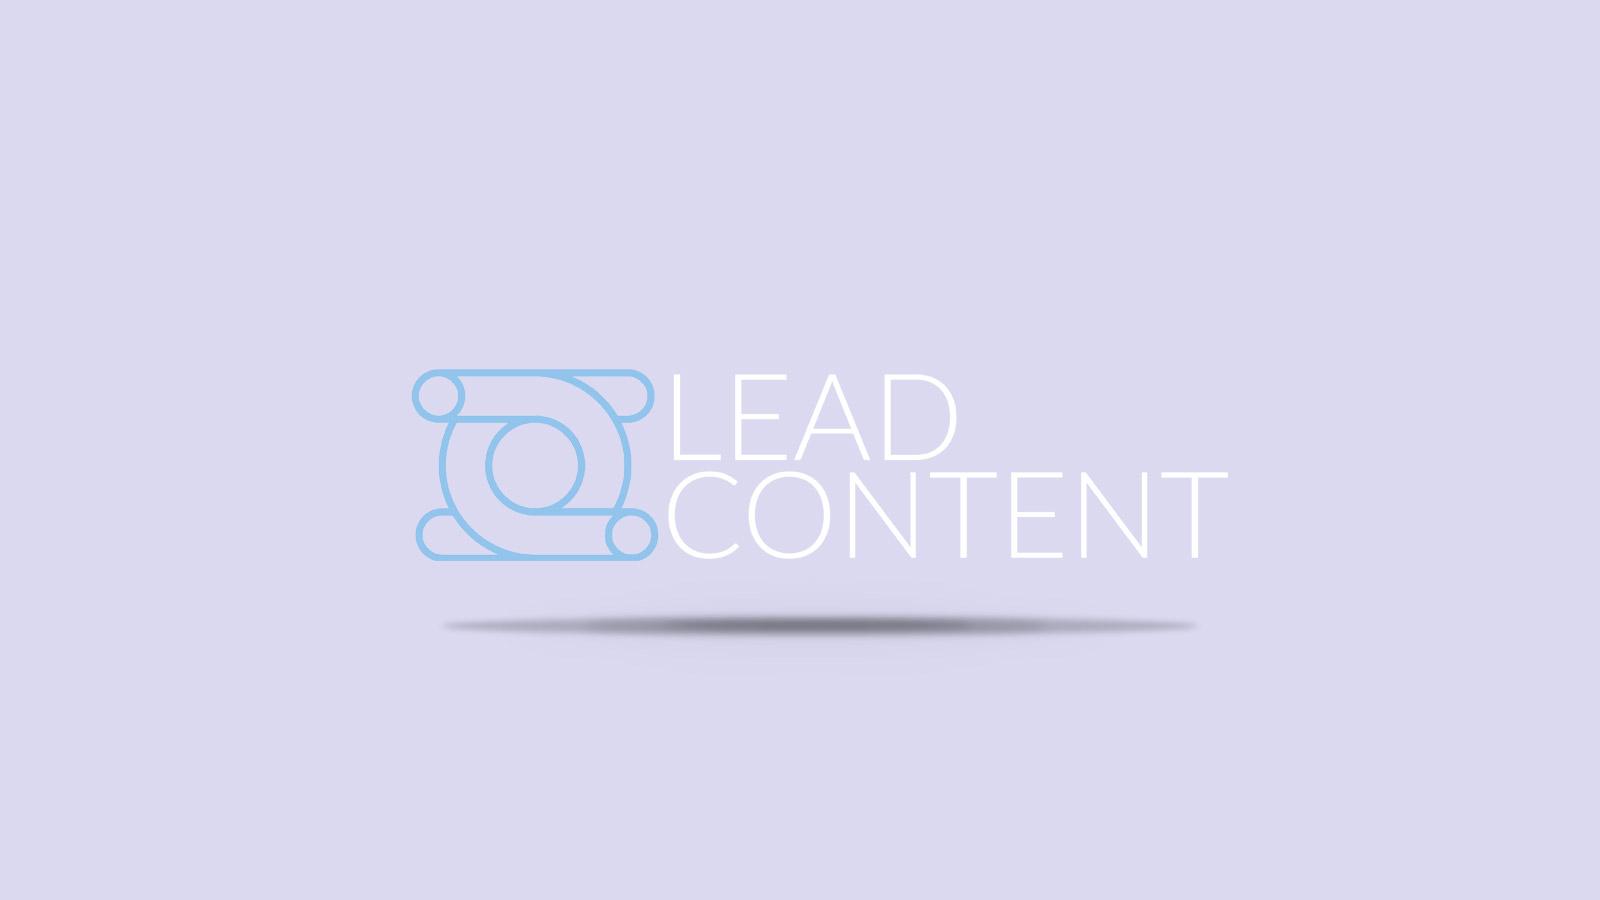 Lead Content